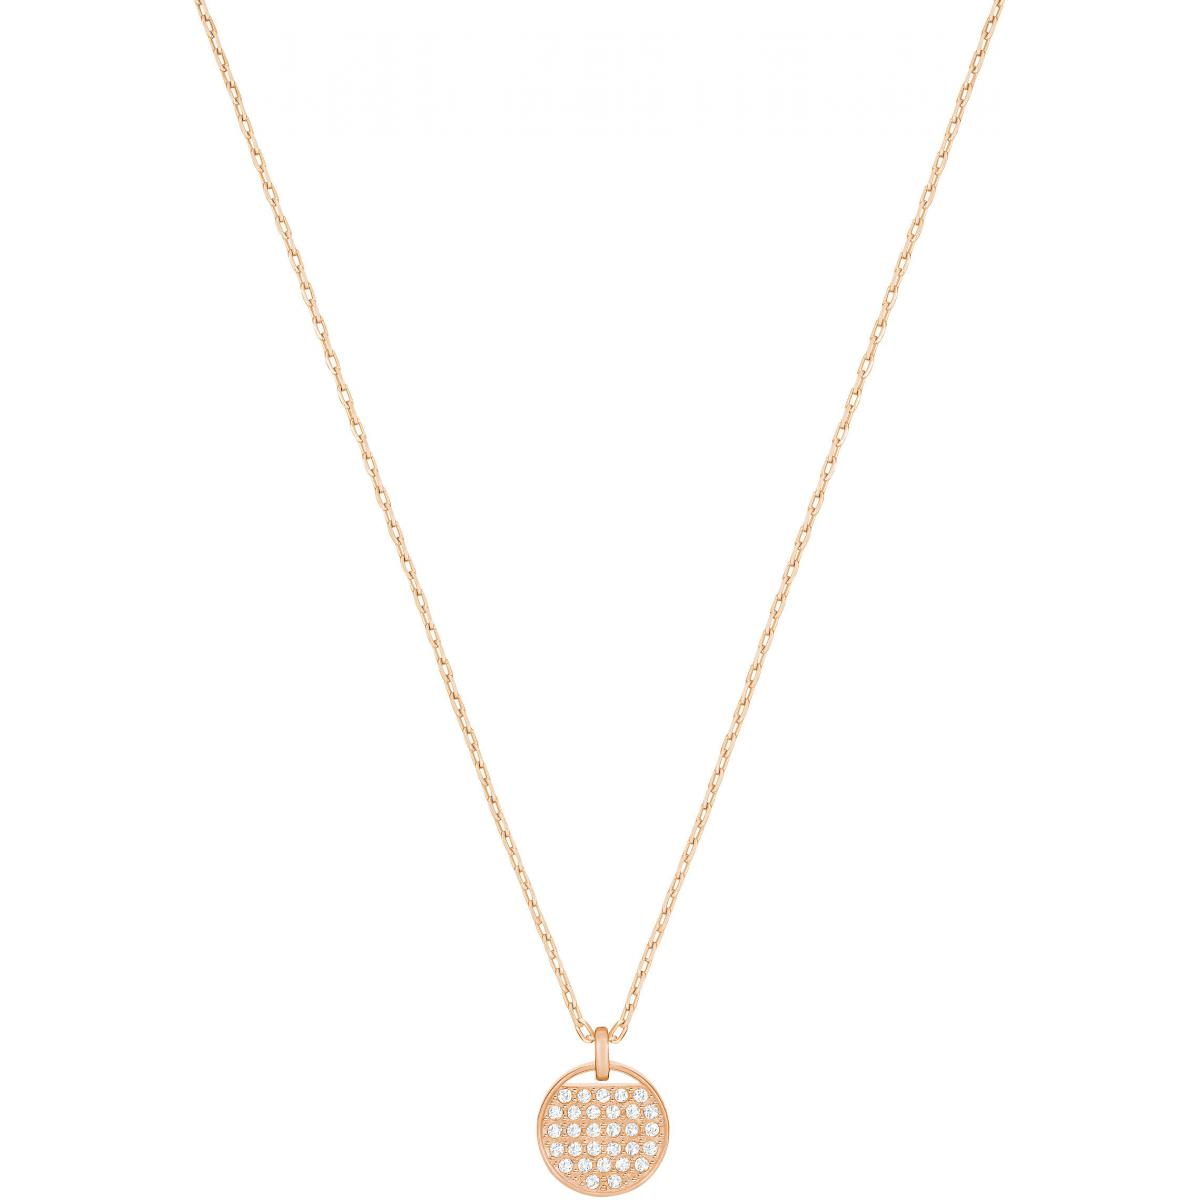 Collier et pendentif Swarovski 5265913 - Collier et pendentif Plaque Or  rose Femme